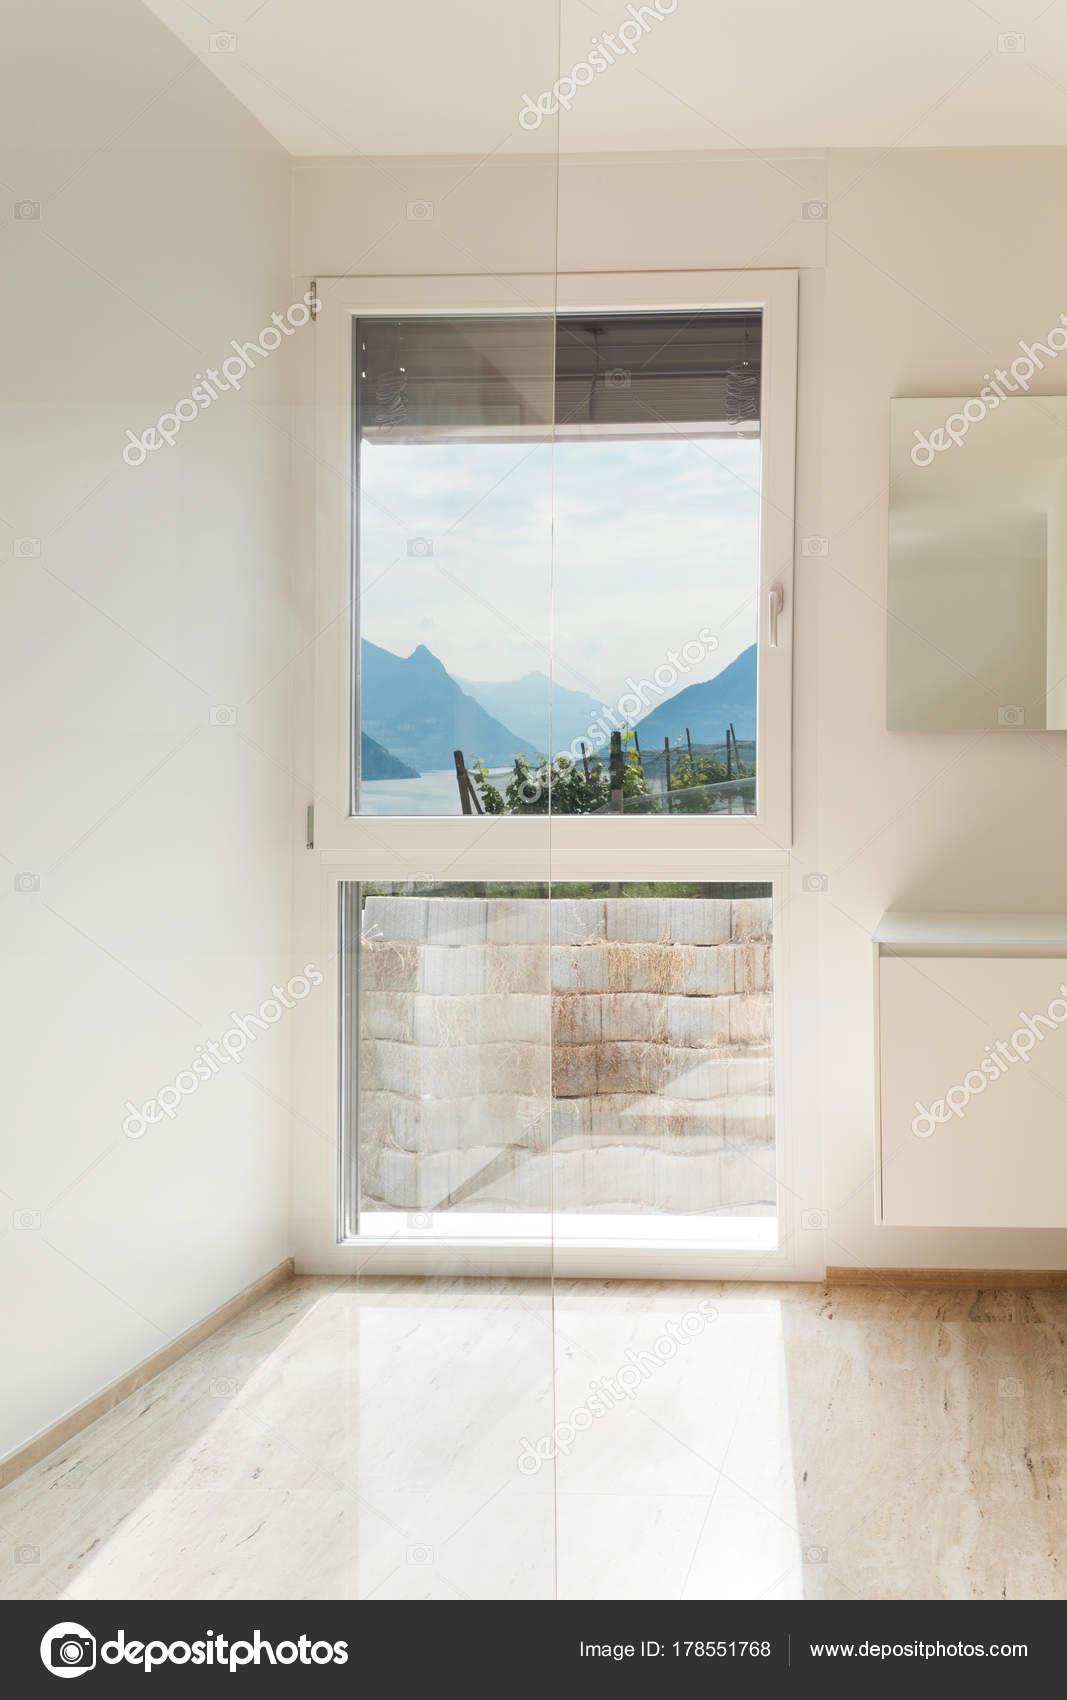 Mooie Moderne Badkamer Marmeren Vloer — Stockfoto © Zveiger #178551768